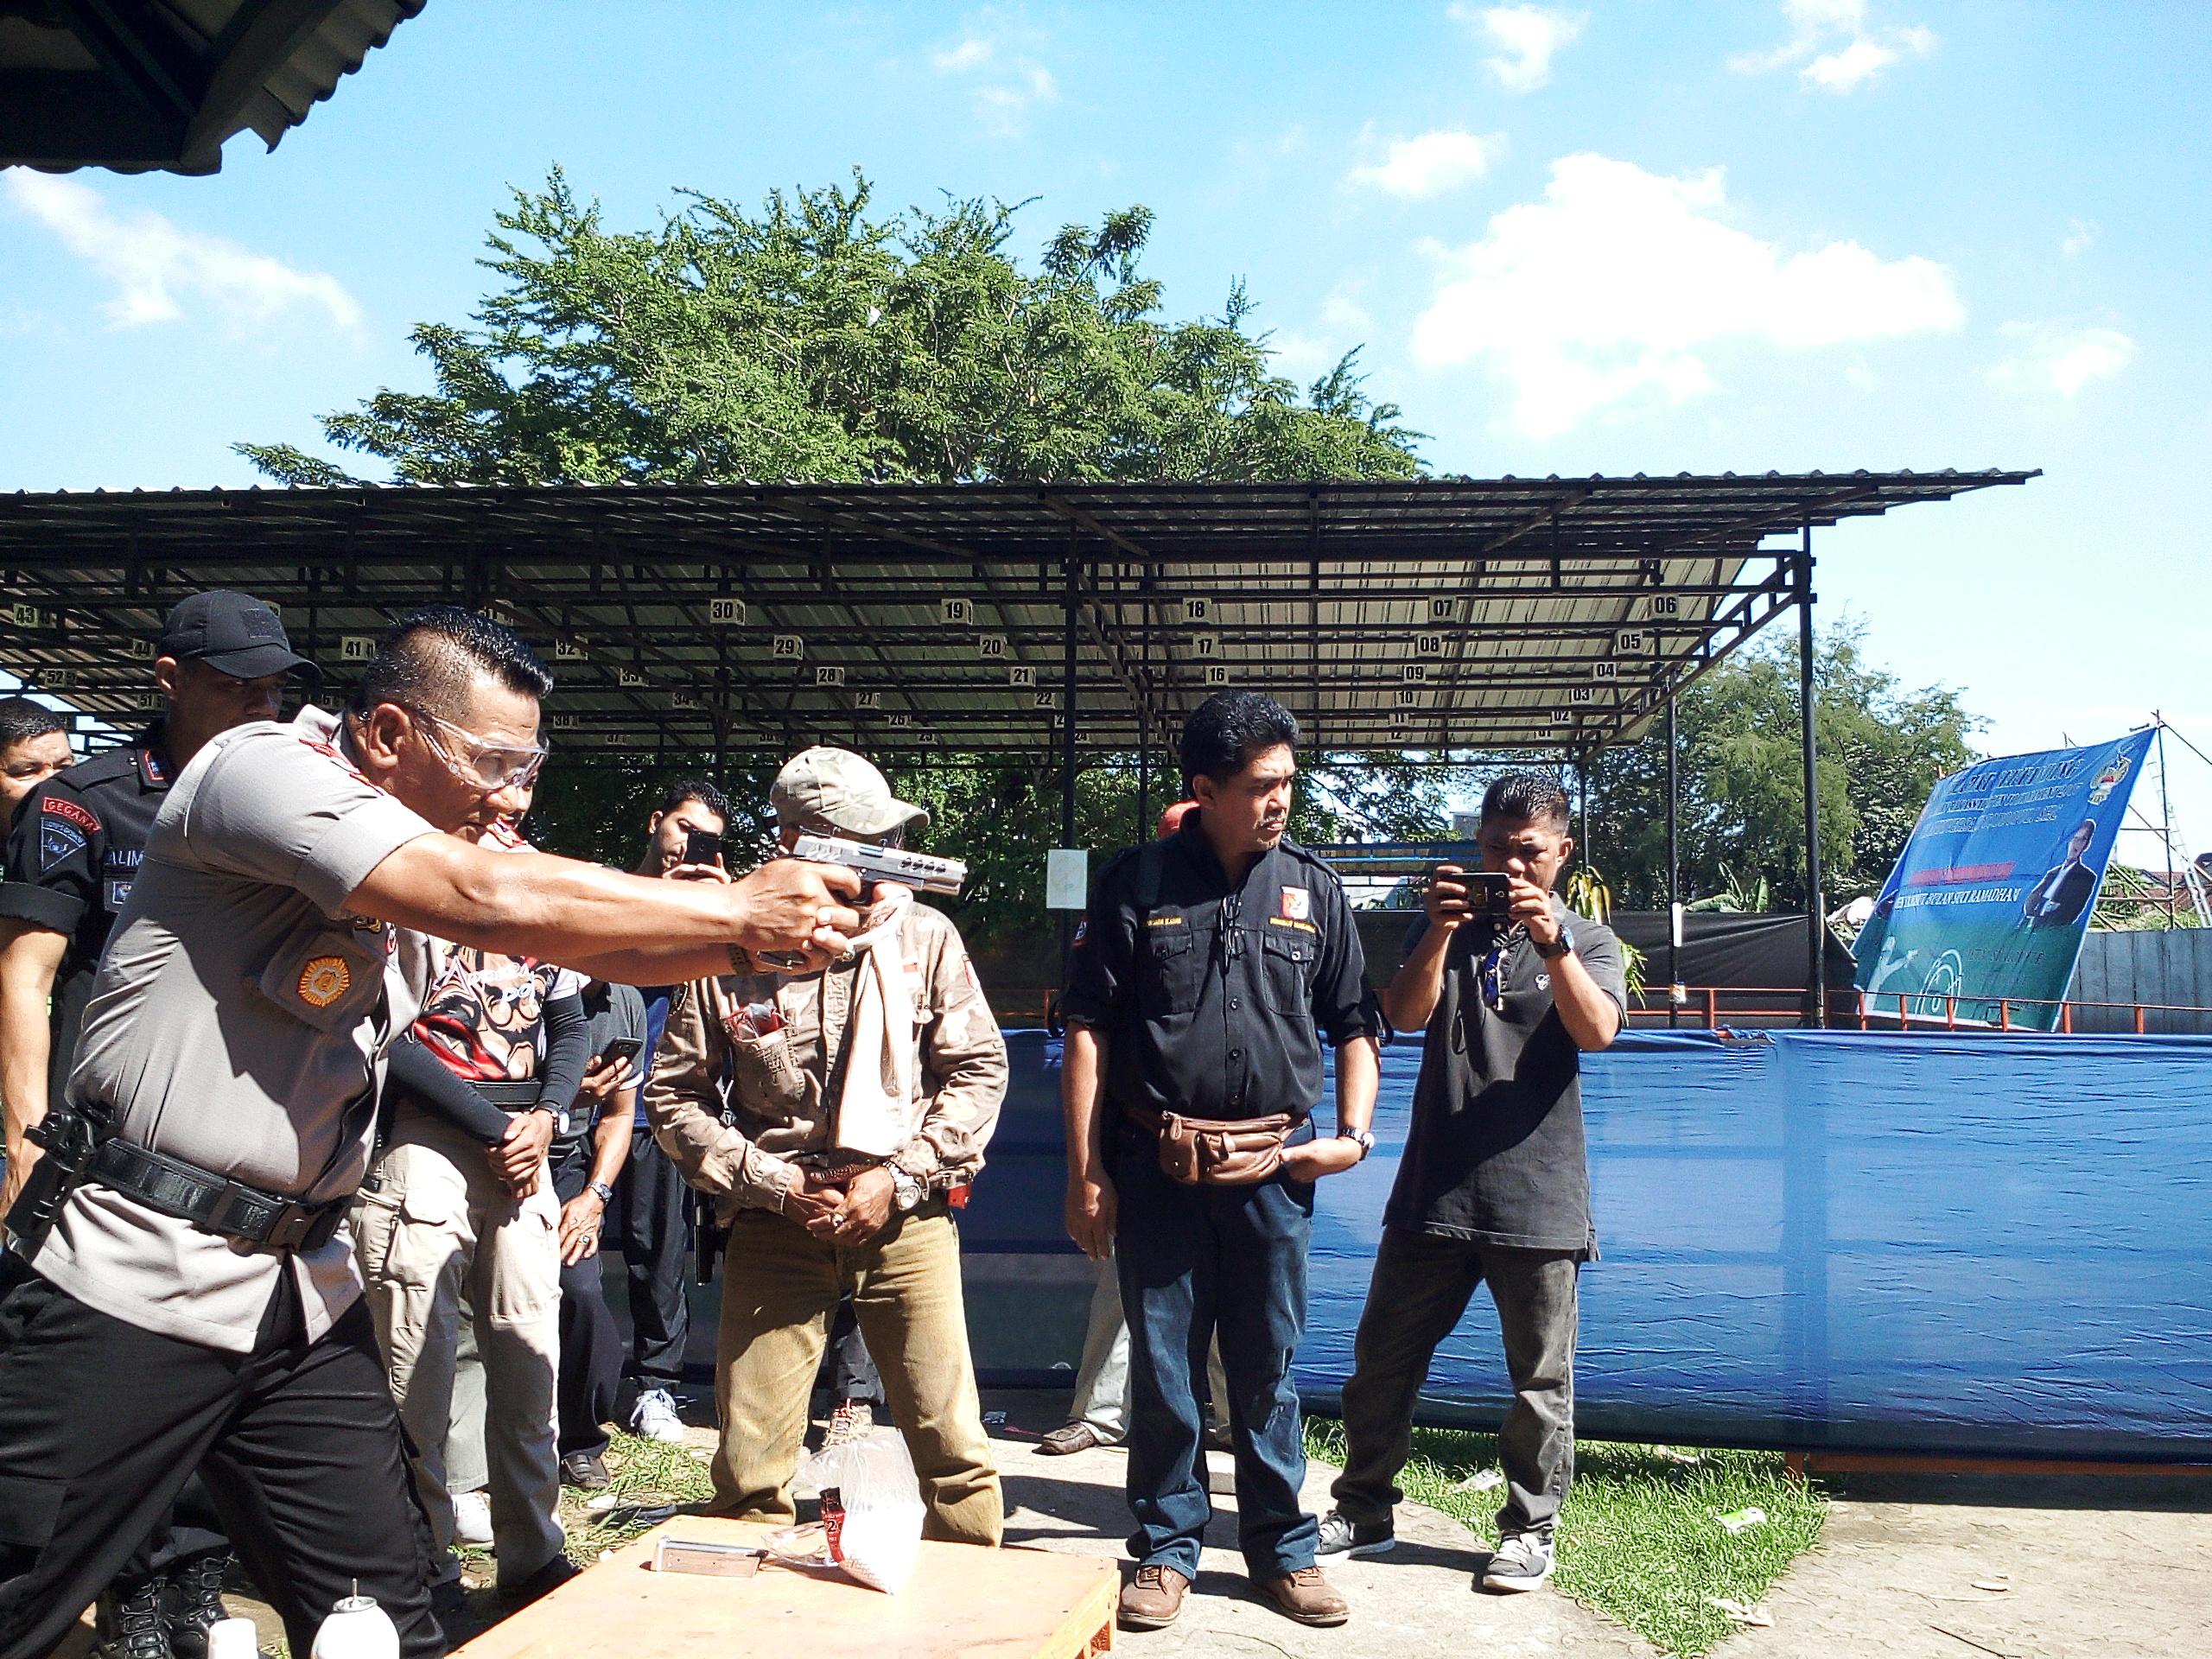 Ketua Pengkot Perbakin Makassar pada Eksebisi Air Soft Gun